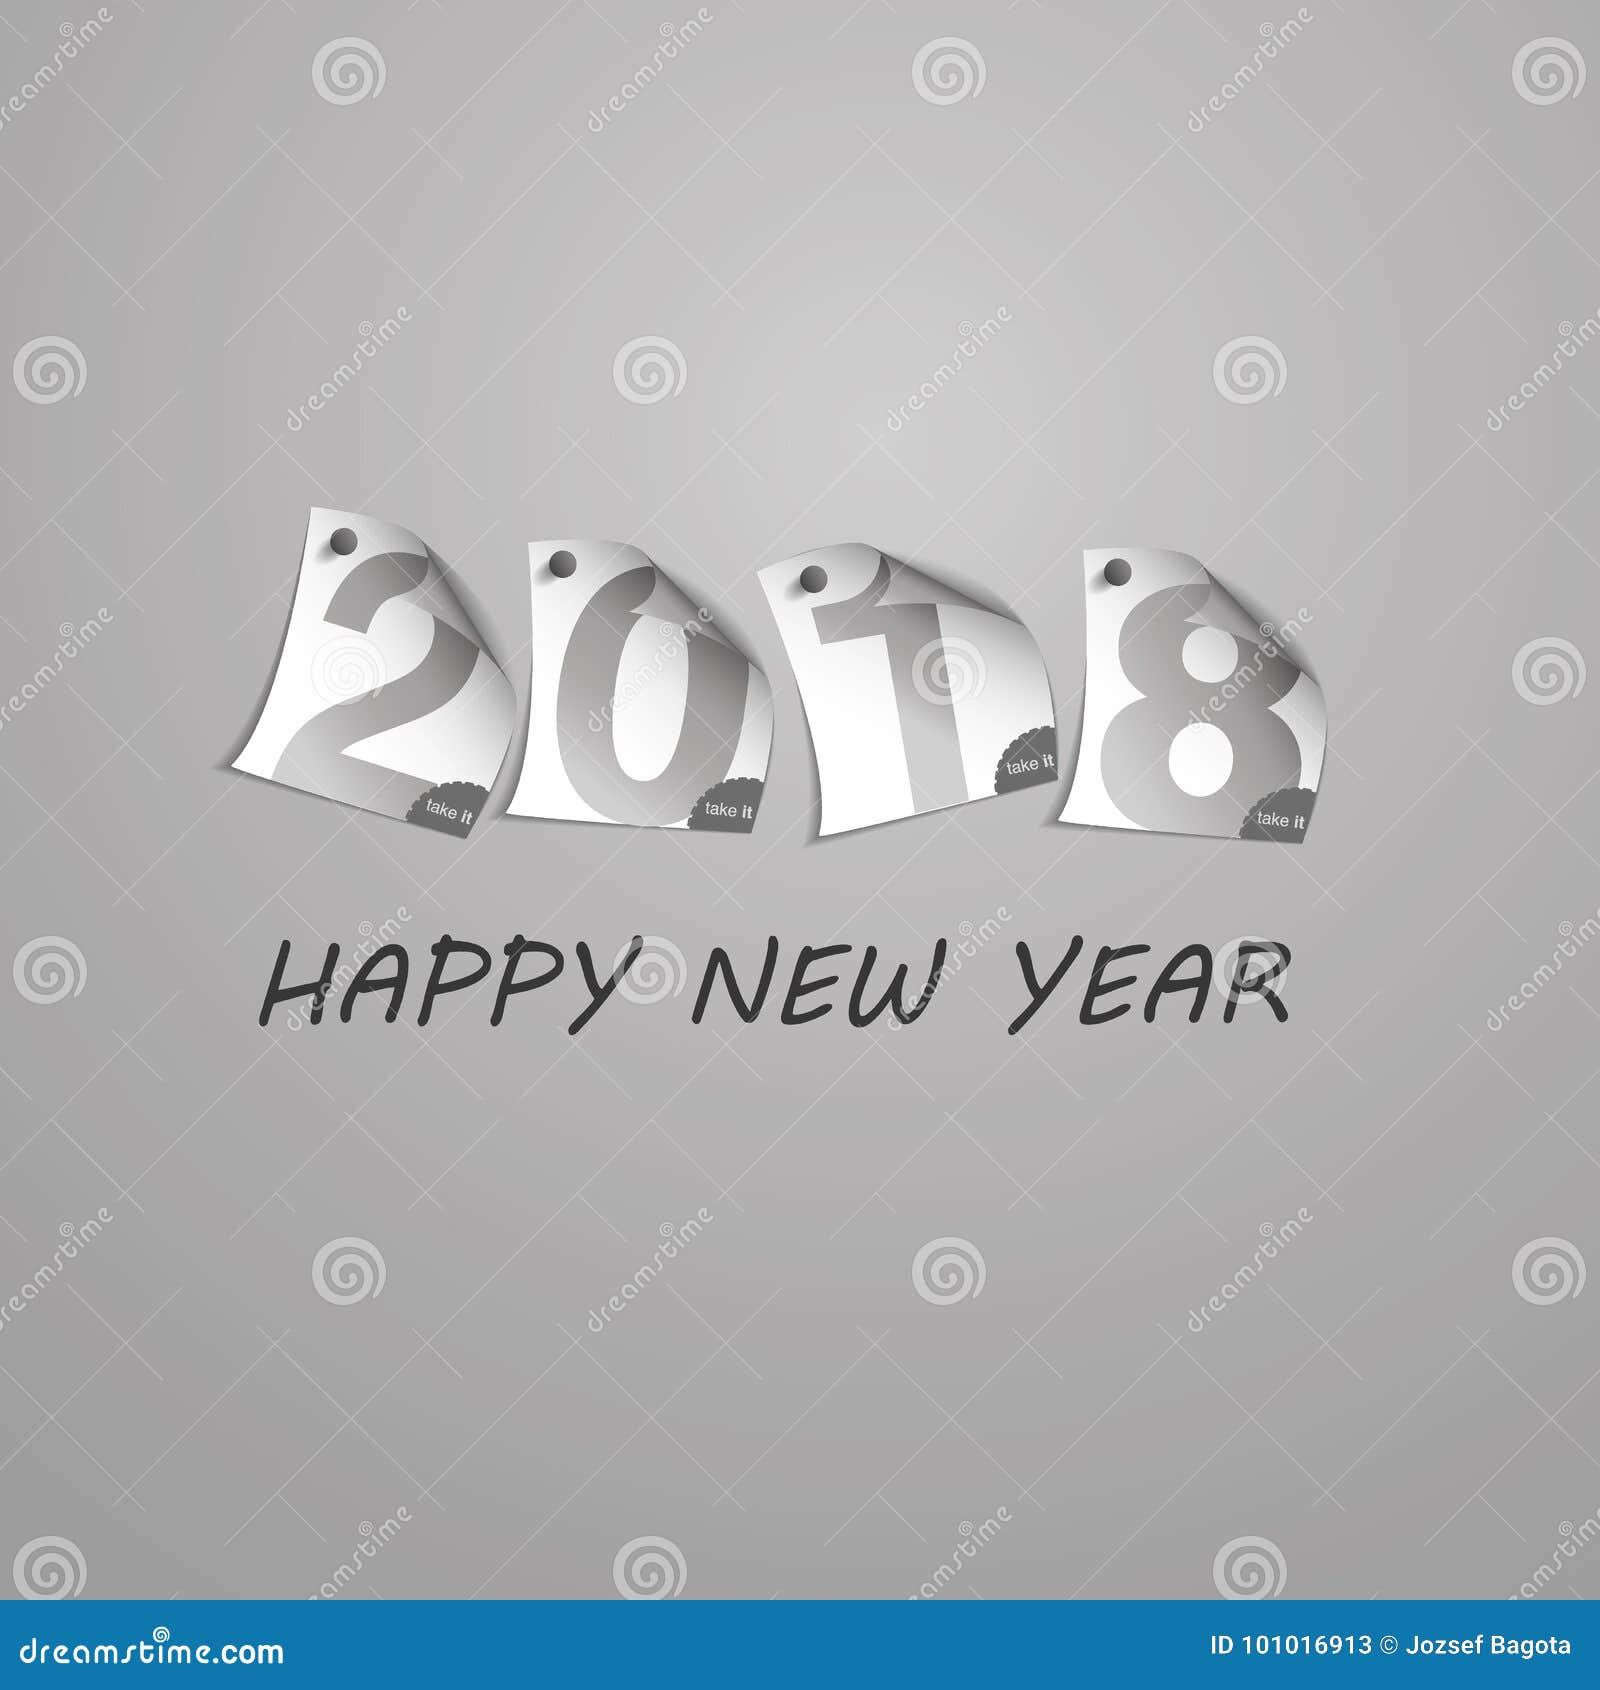 Abstrakt silverGrey New Year Card Template design med tal